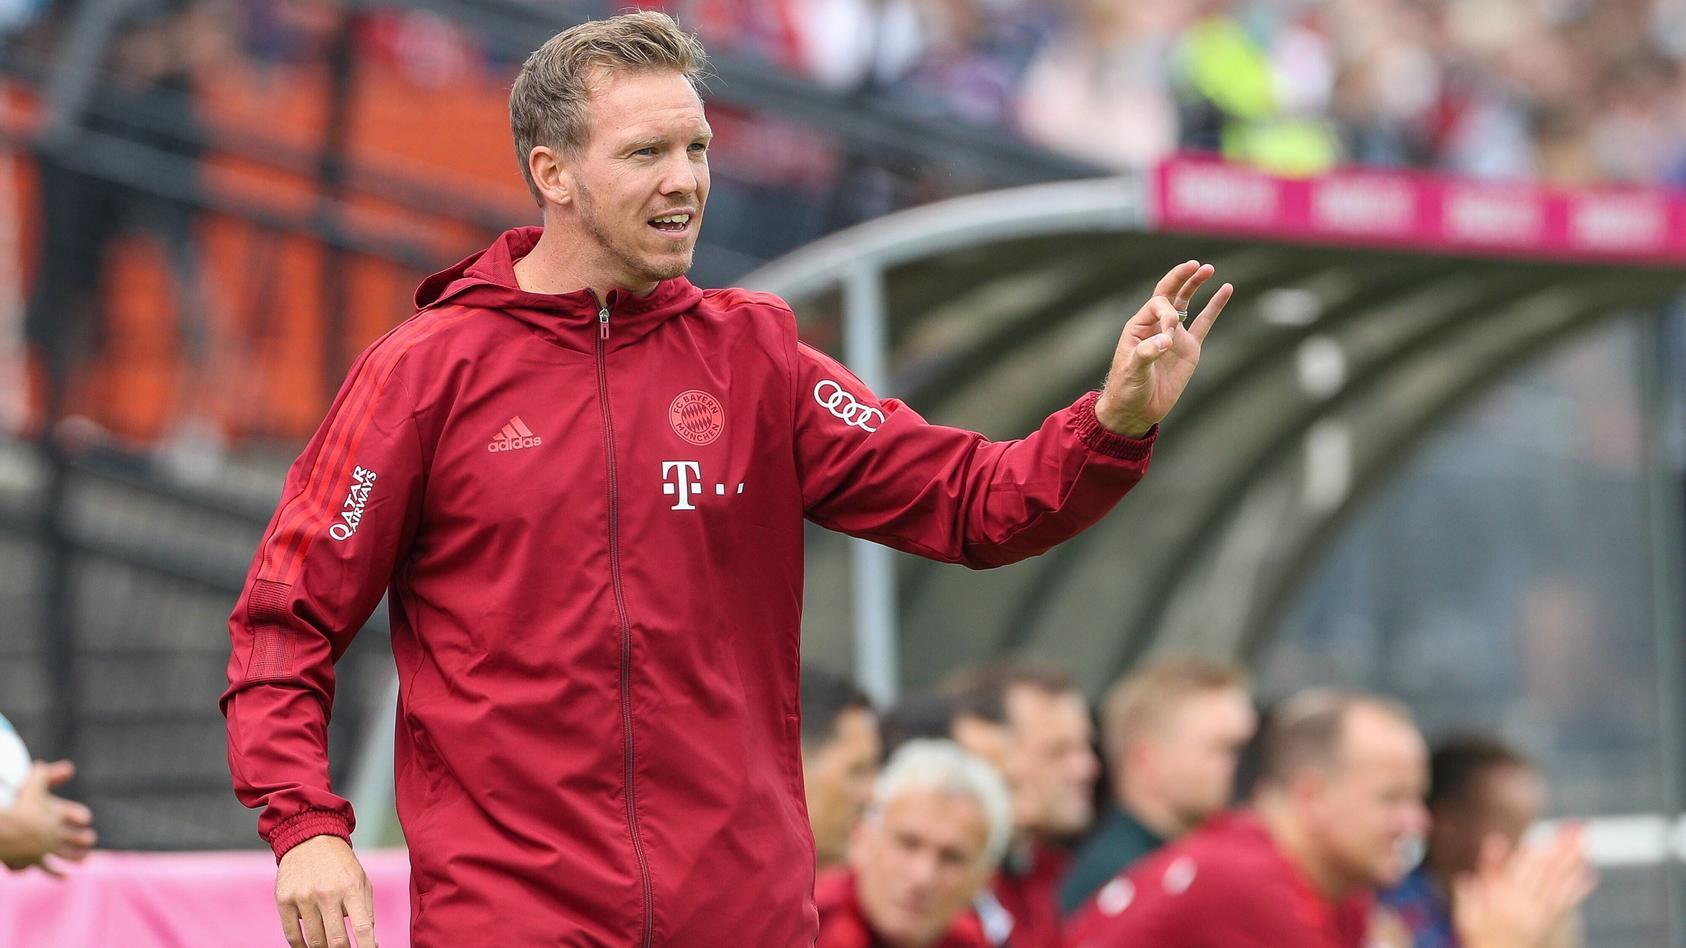 Gegen Ajax muss sich das Team um Neu-Trainer Julian Nagelsmann zum ersten Mal so richtig ins Zeug legen.